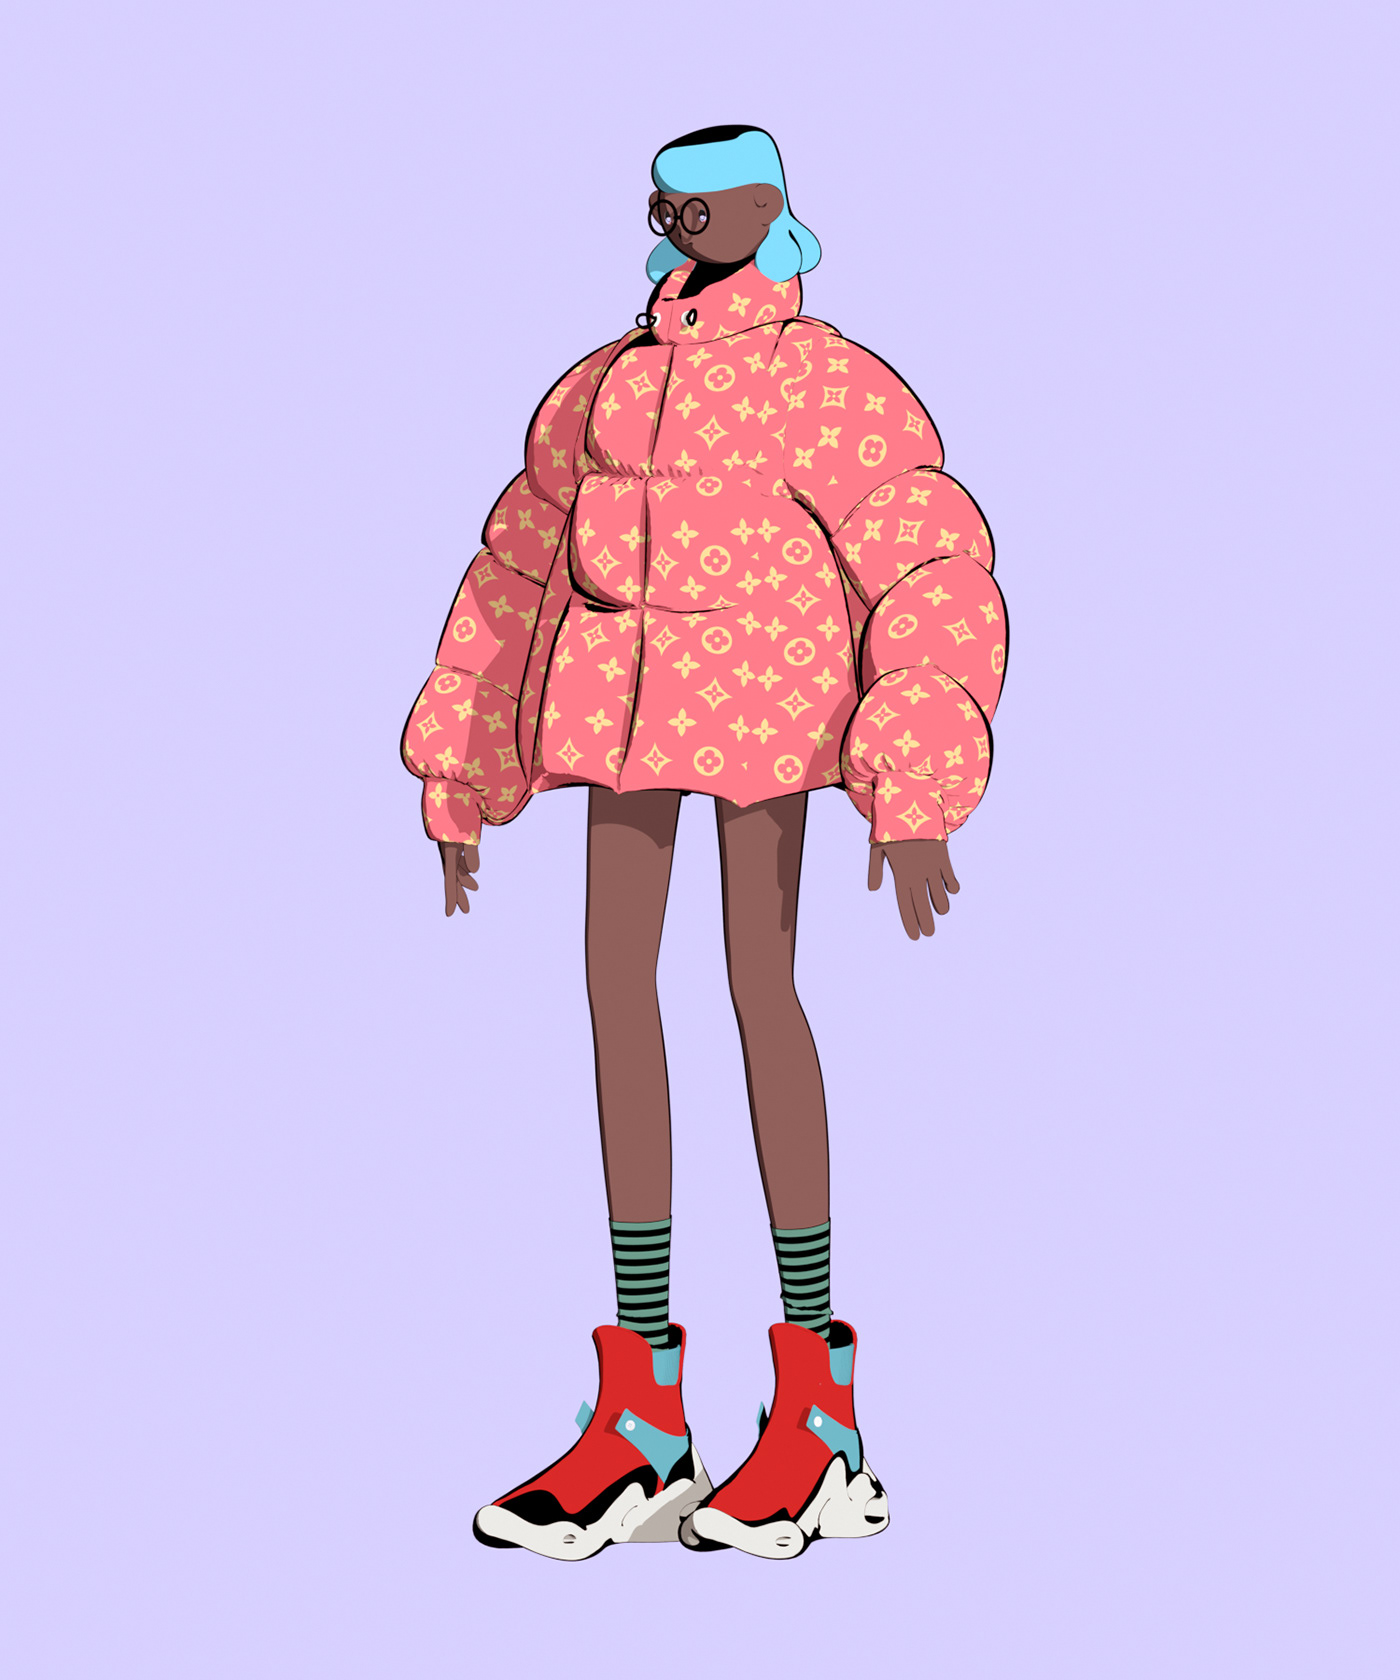 3D adobe illustrator Clothing color girl illustration illustrations marvelous designer